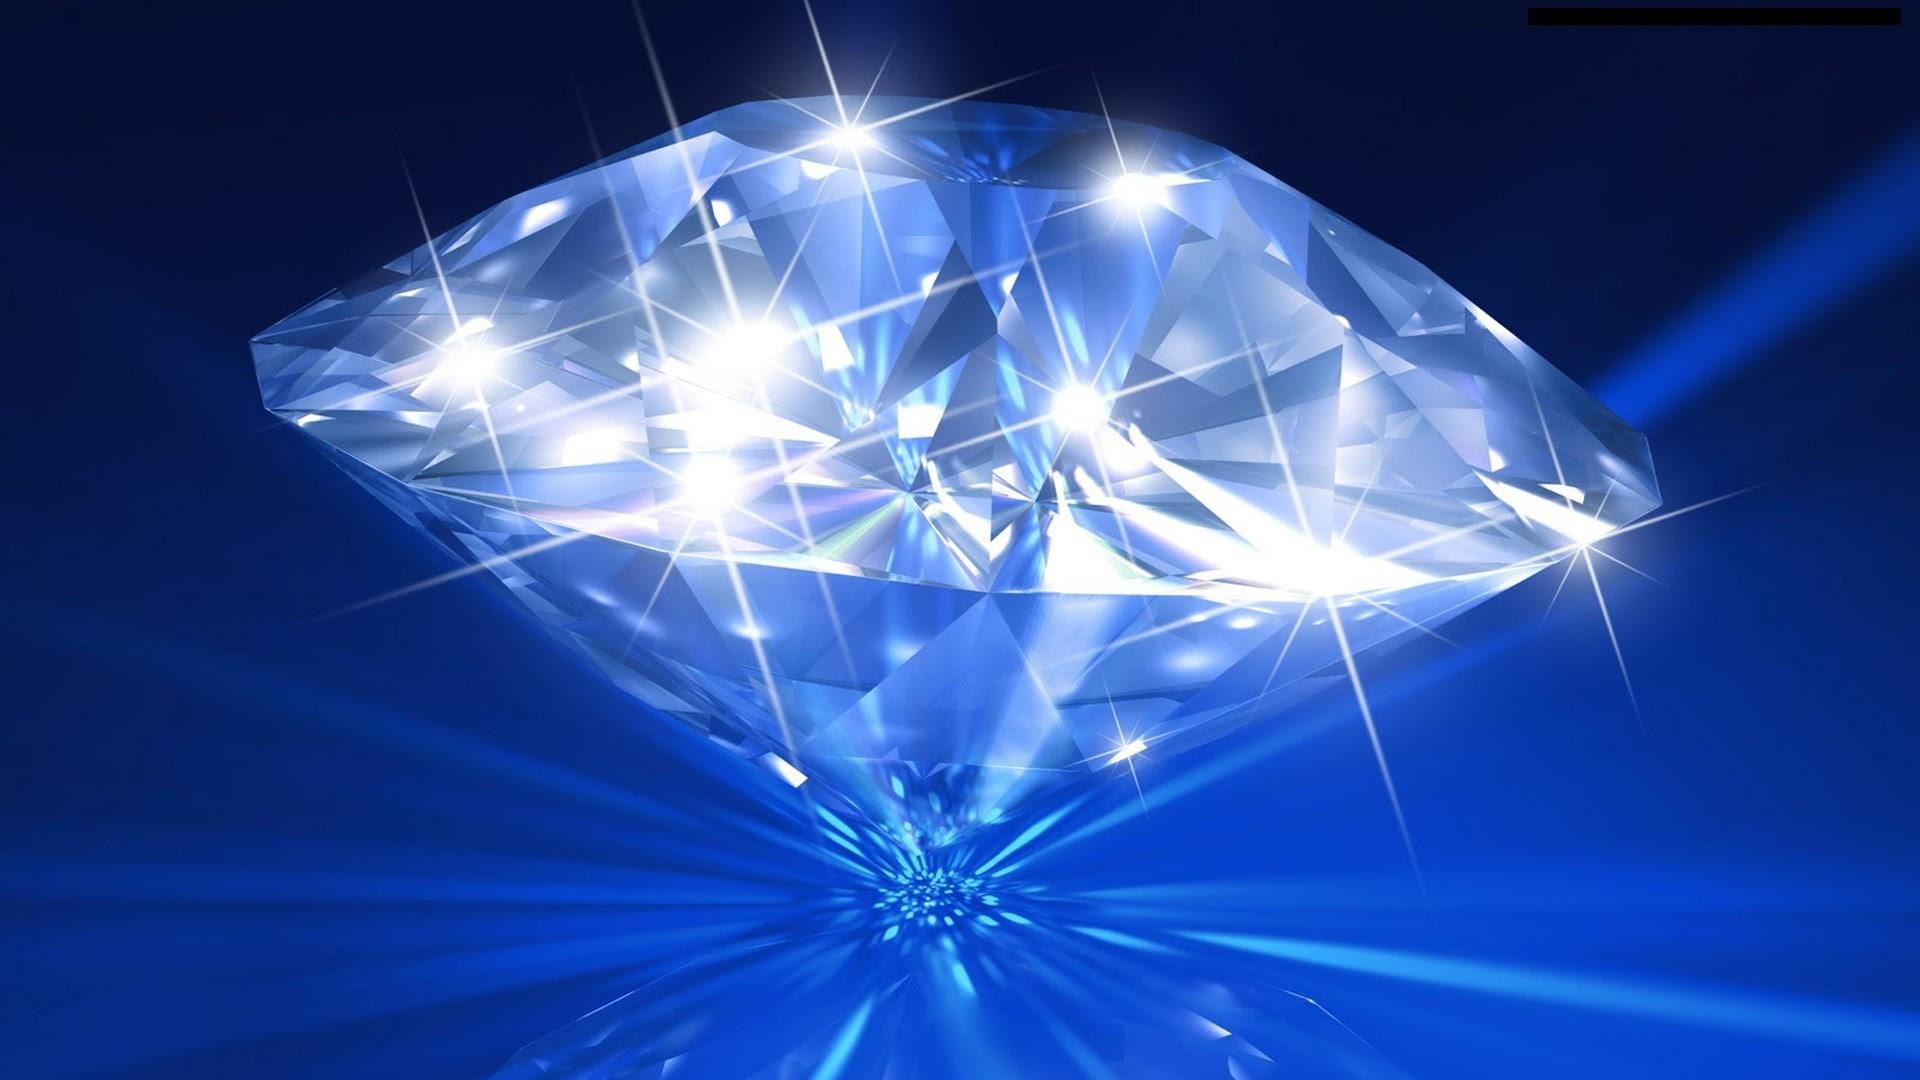 Blue Diamond Wallpaper (60+ images)